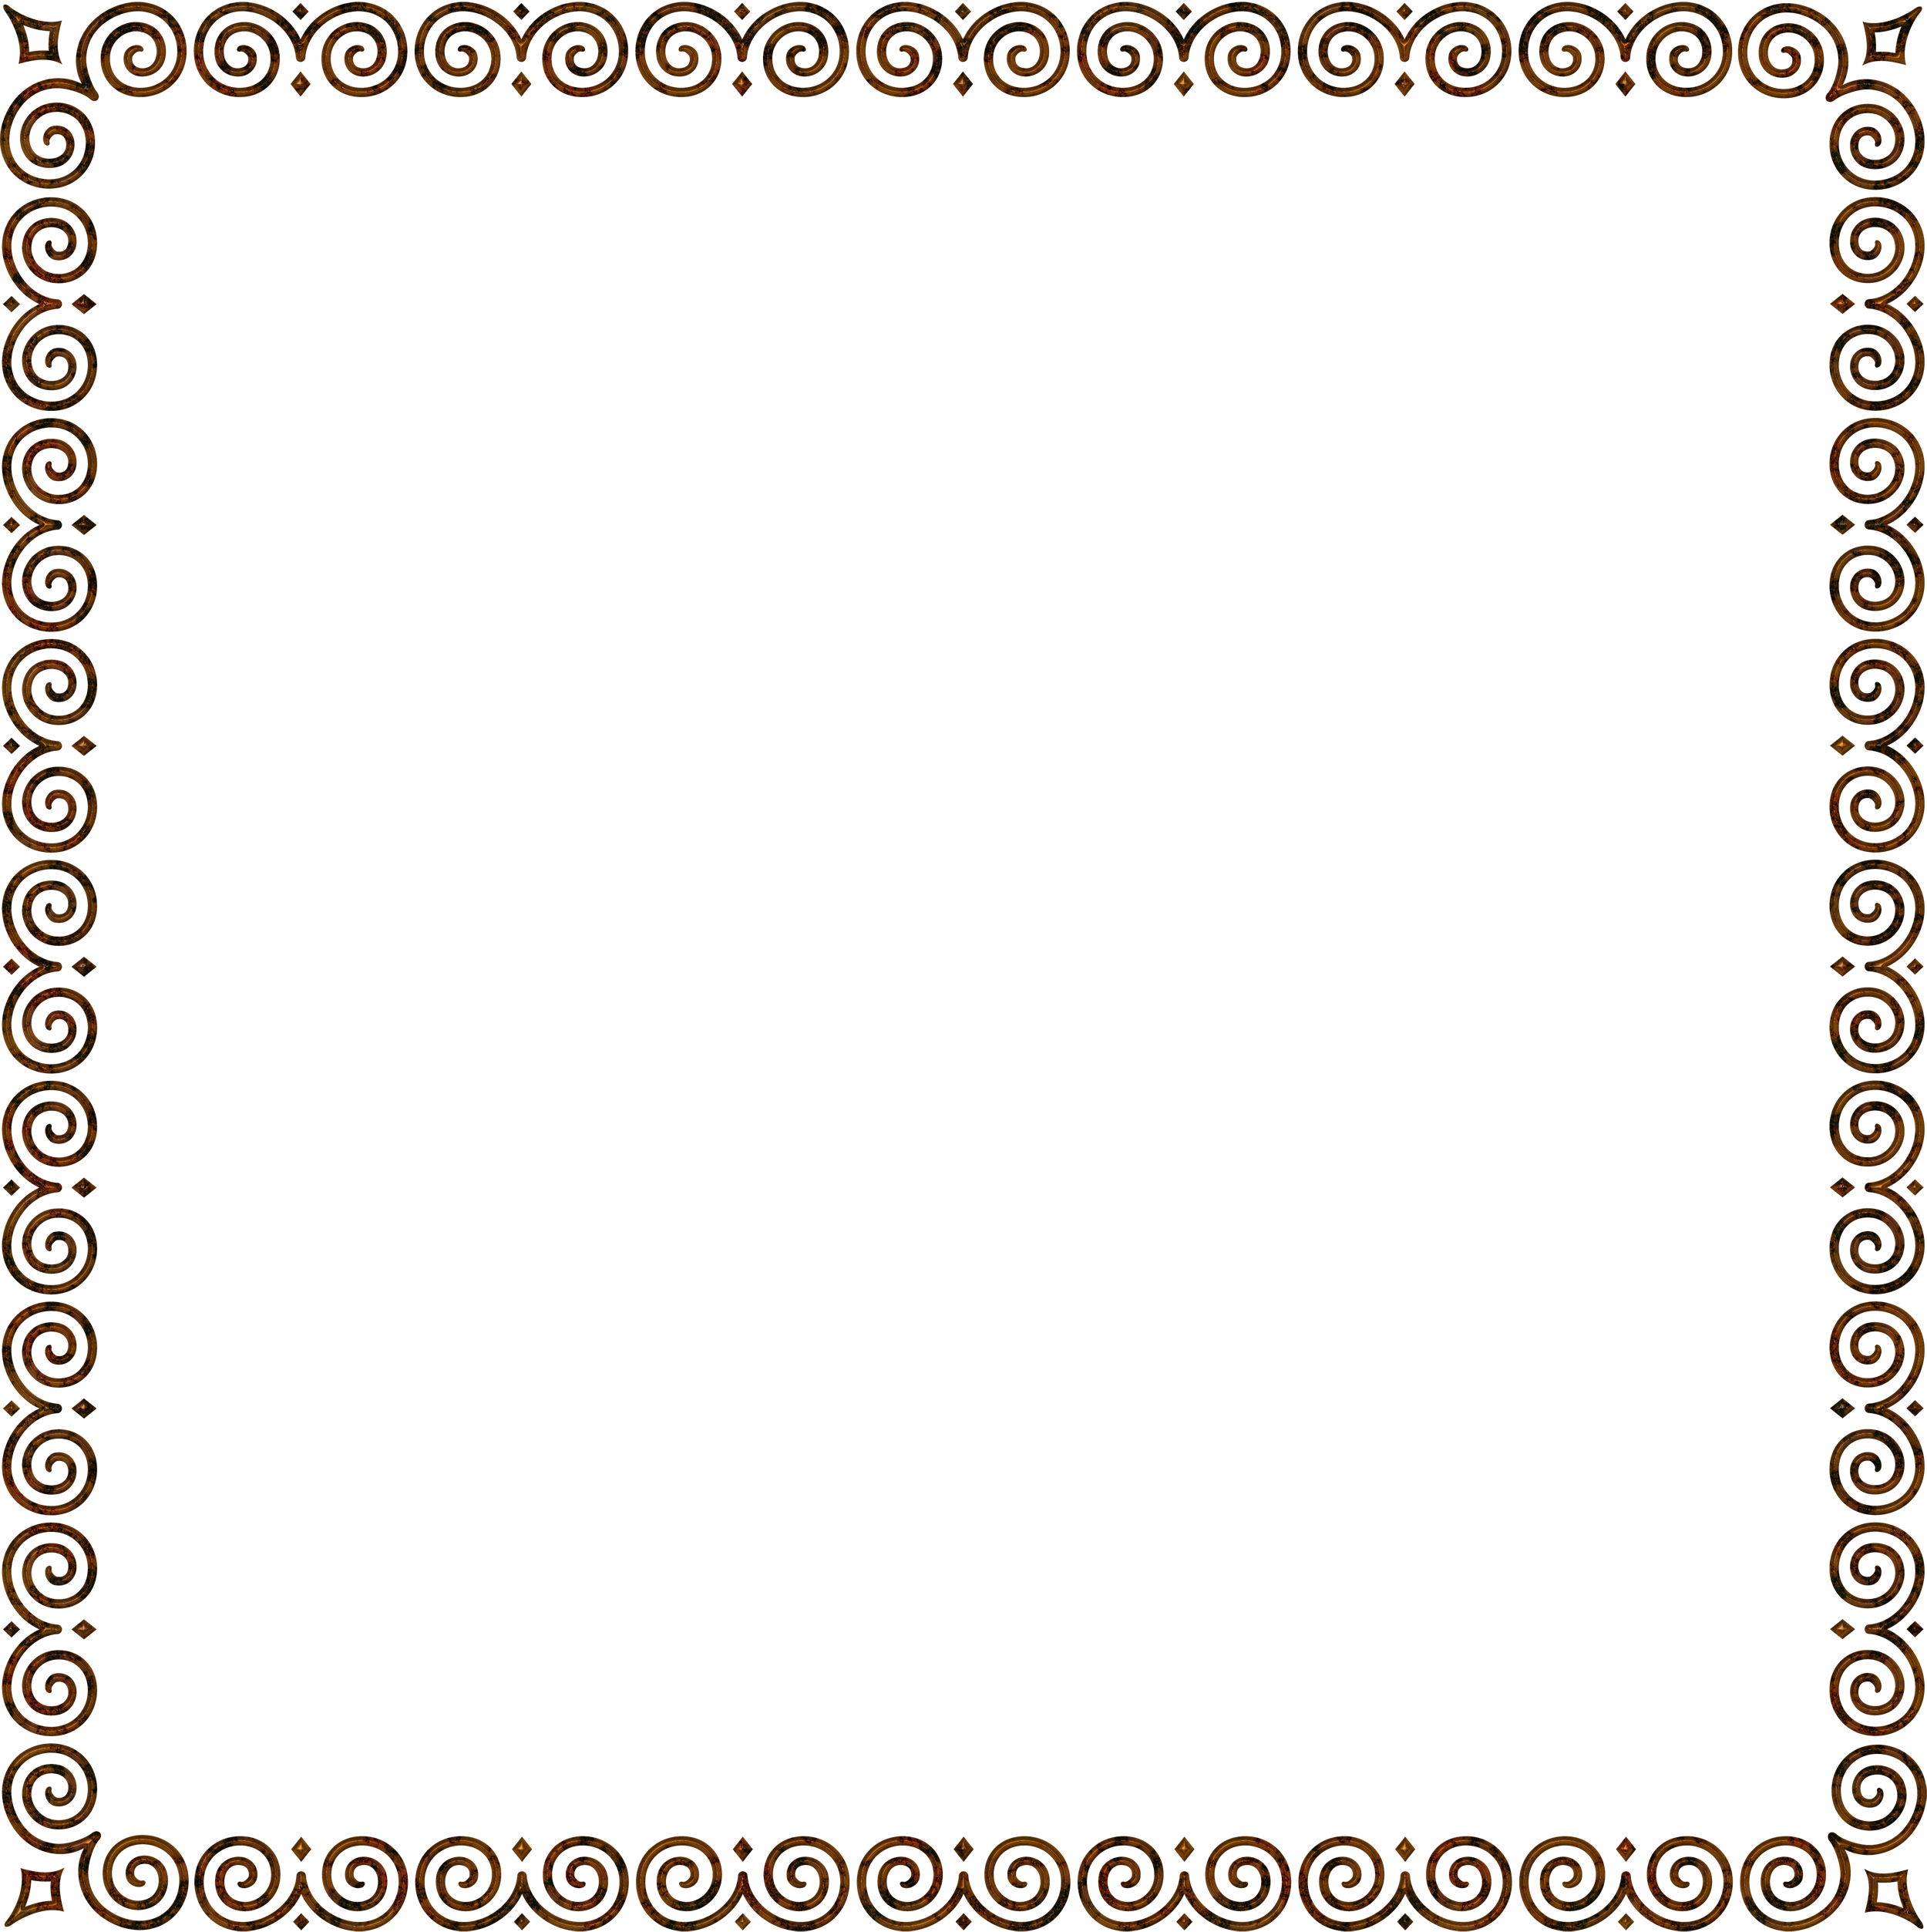 ramka loveramki online, рамки png, рамки psd, рамки детские, ramki ua, рамки своими руками, рамки для картин, ramka love, рамки вектор, рамки 8 марта, рамки весна, рамки для word, рамки hd, рамки сердце, рамки круглые, рамки а4, рамки новогодние, рамки сердечки, рамки из дерева, ramki года